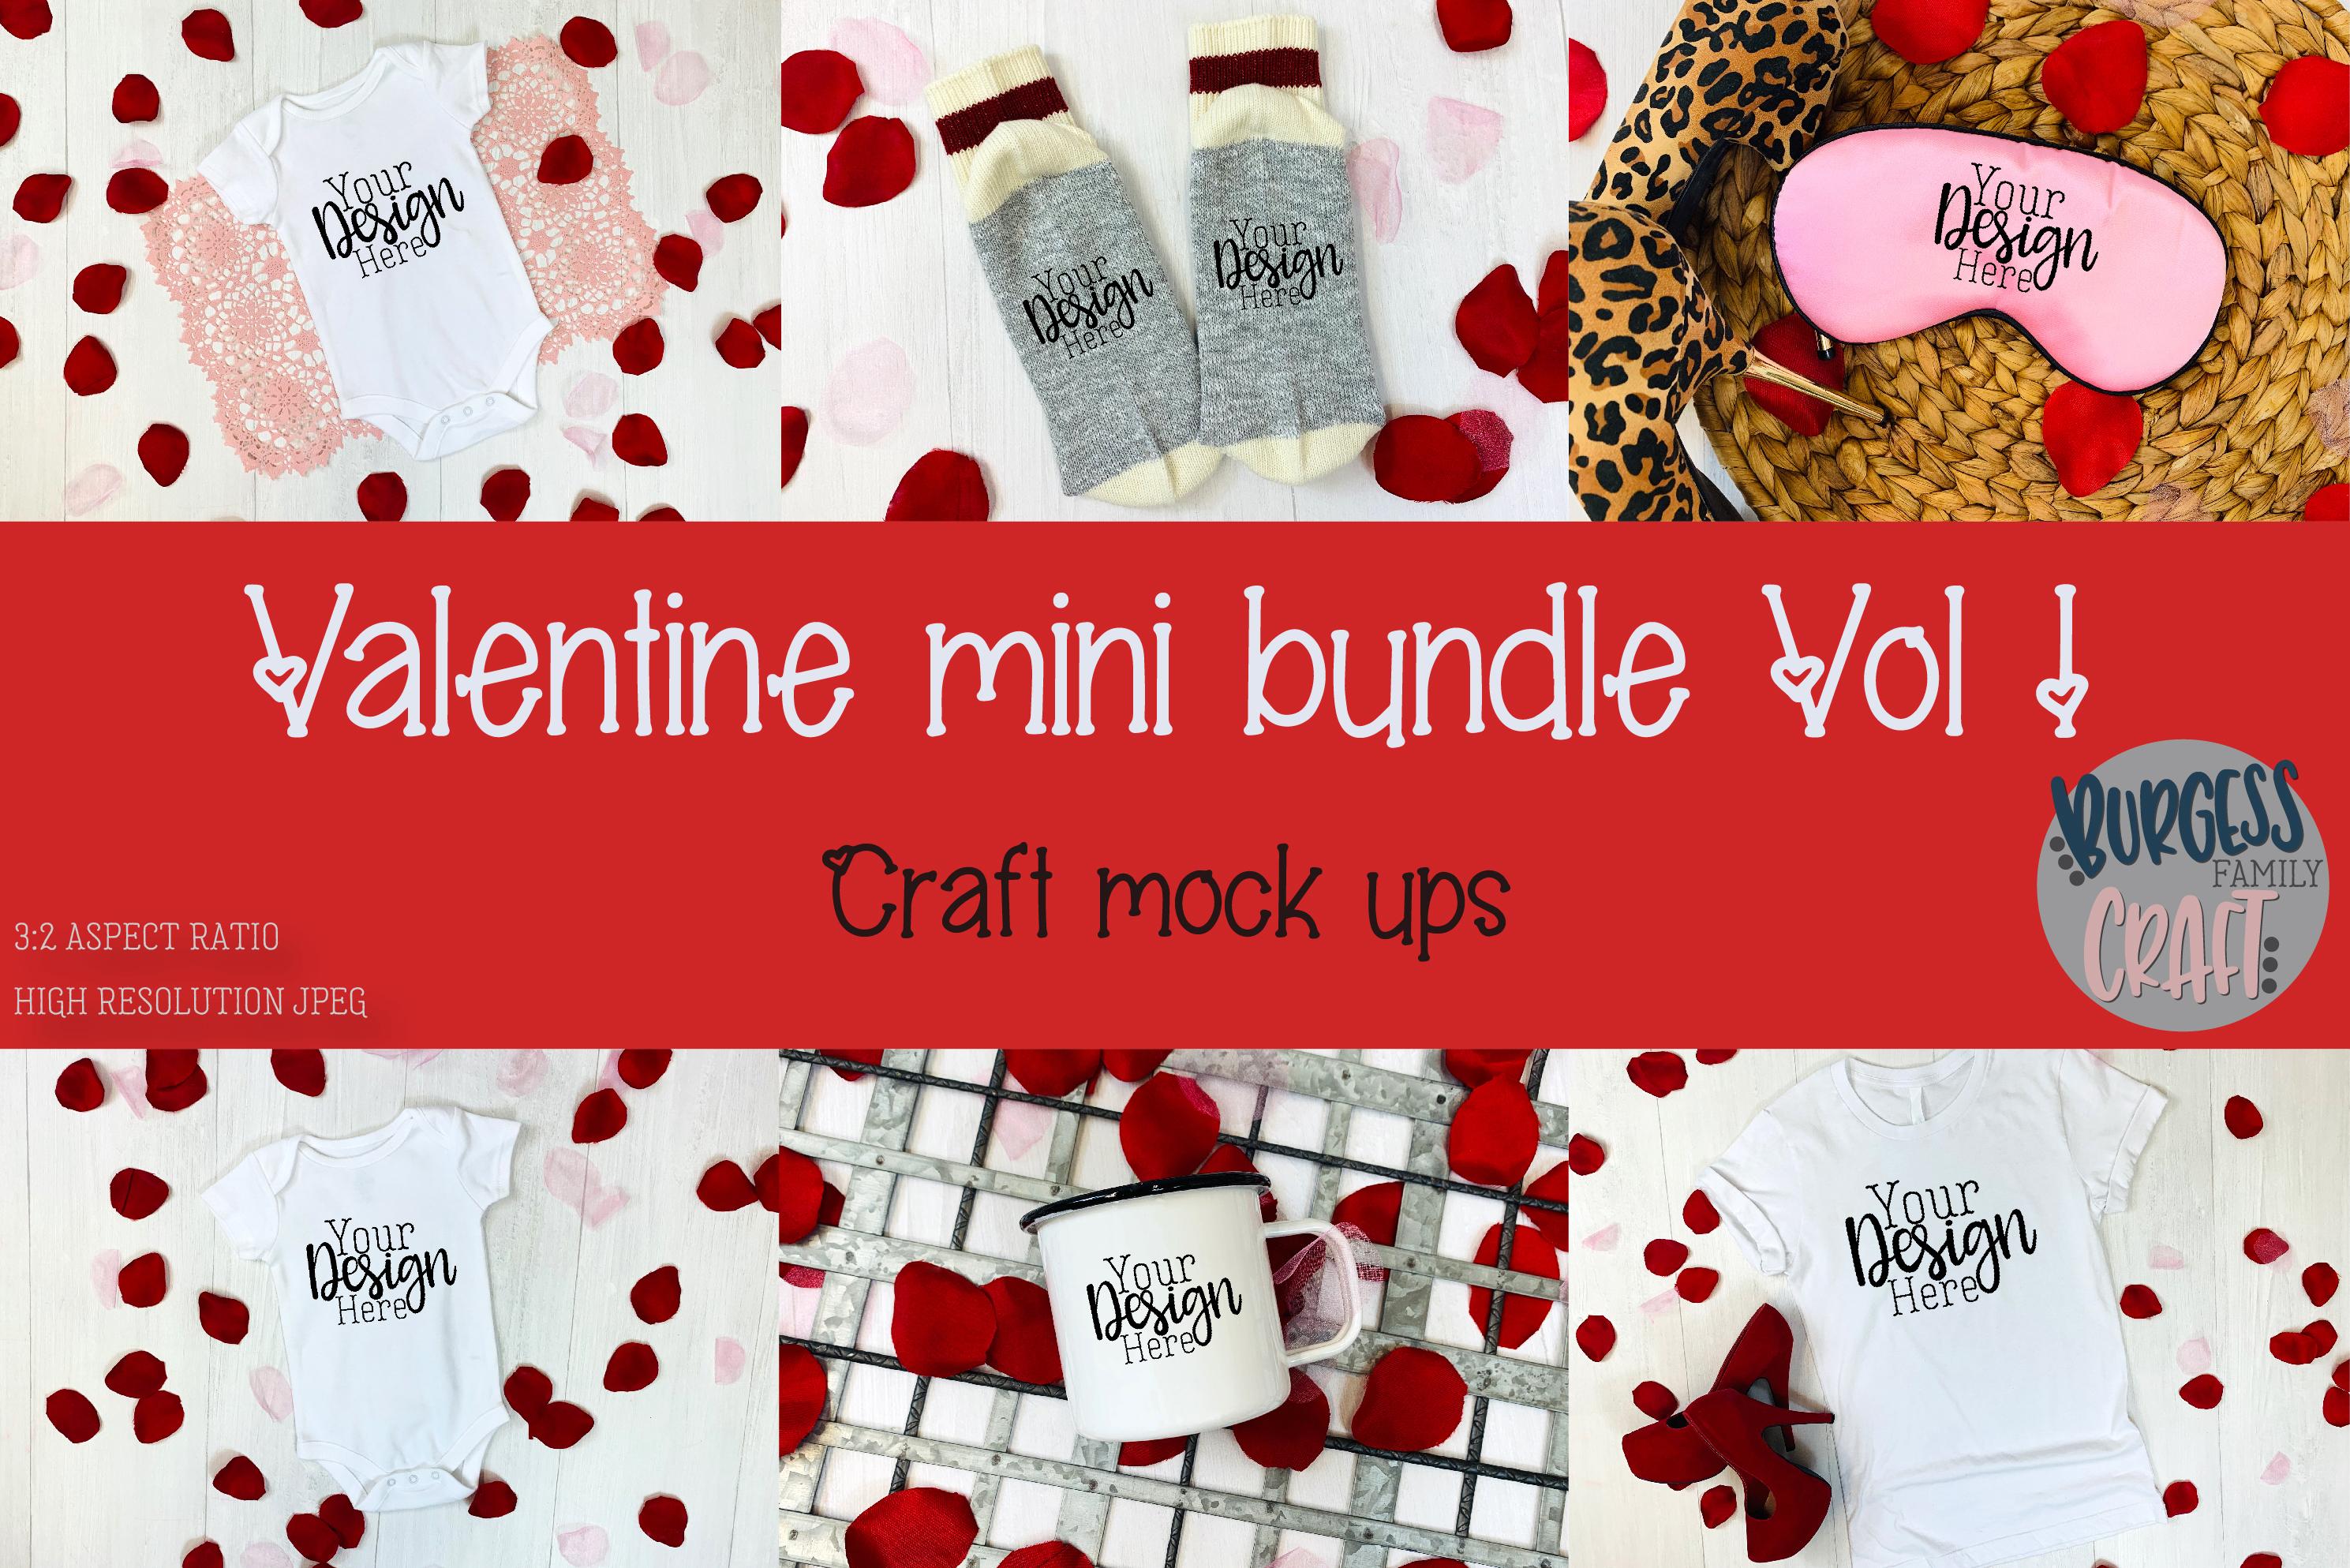 Valentine Mini Bundle Vol I | Craft mock ups example image 1